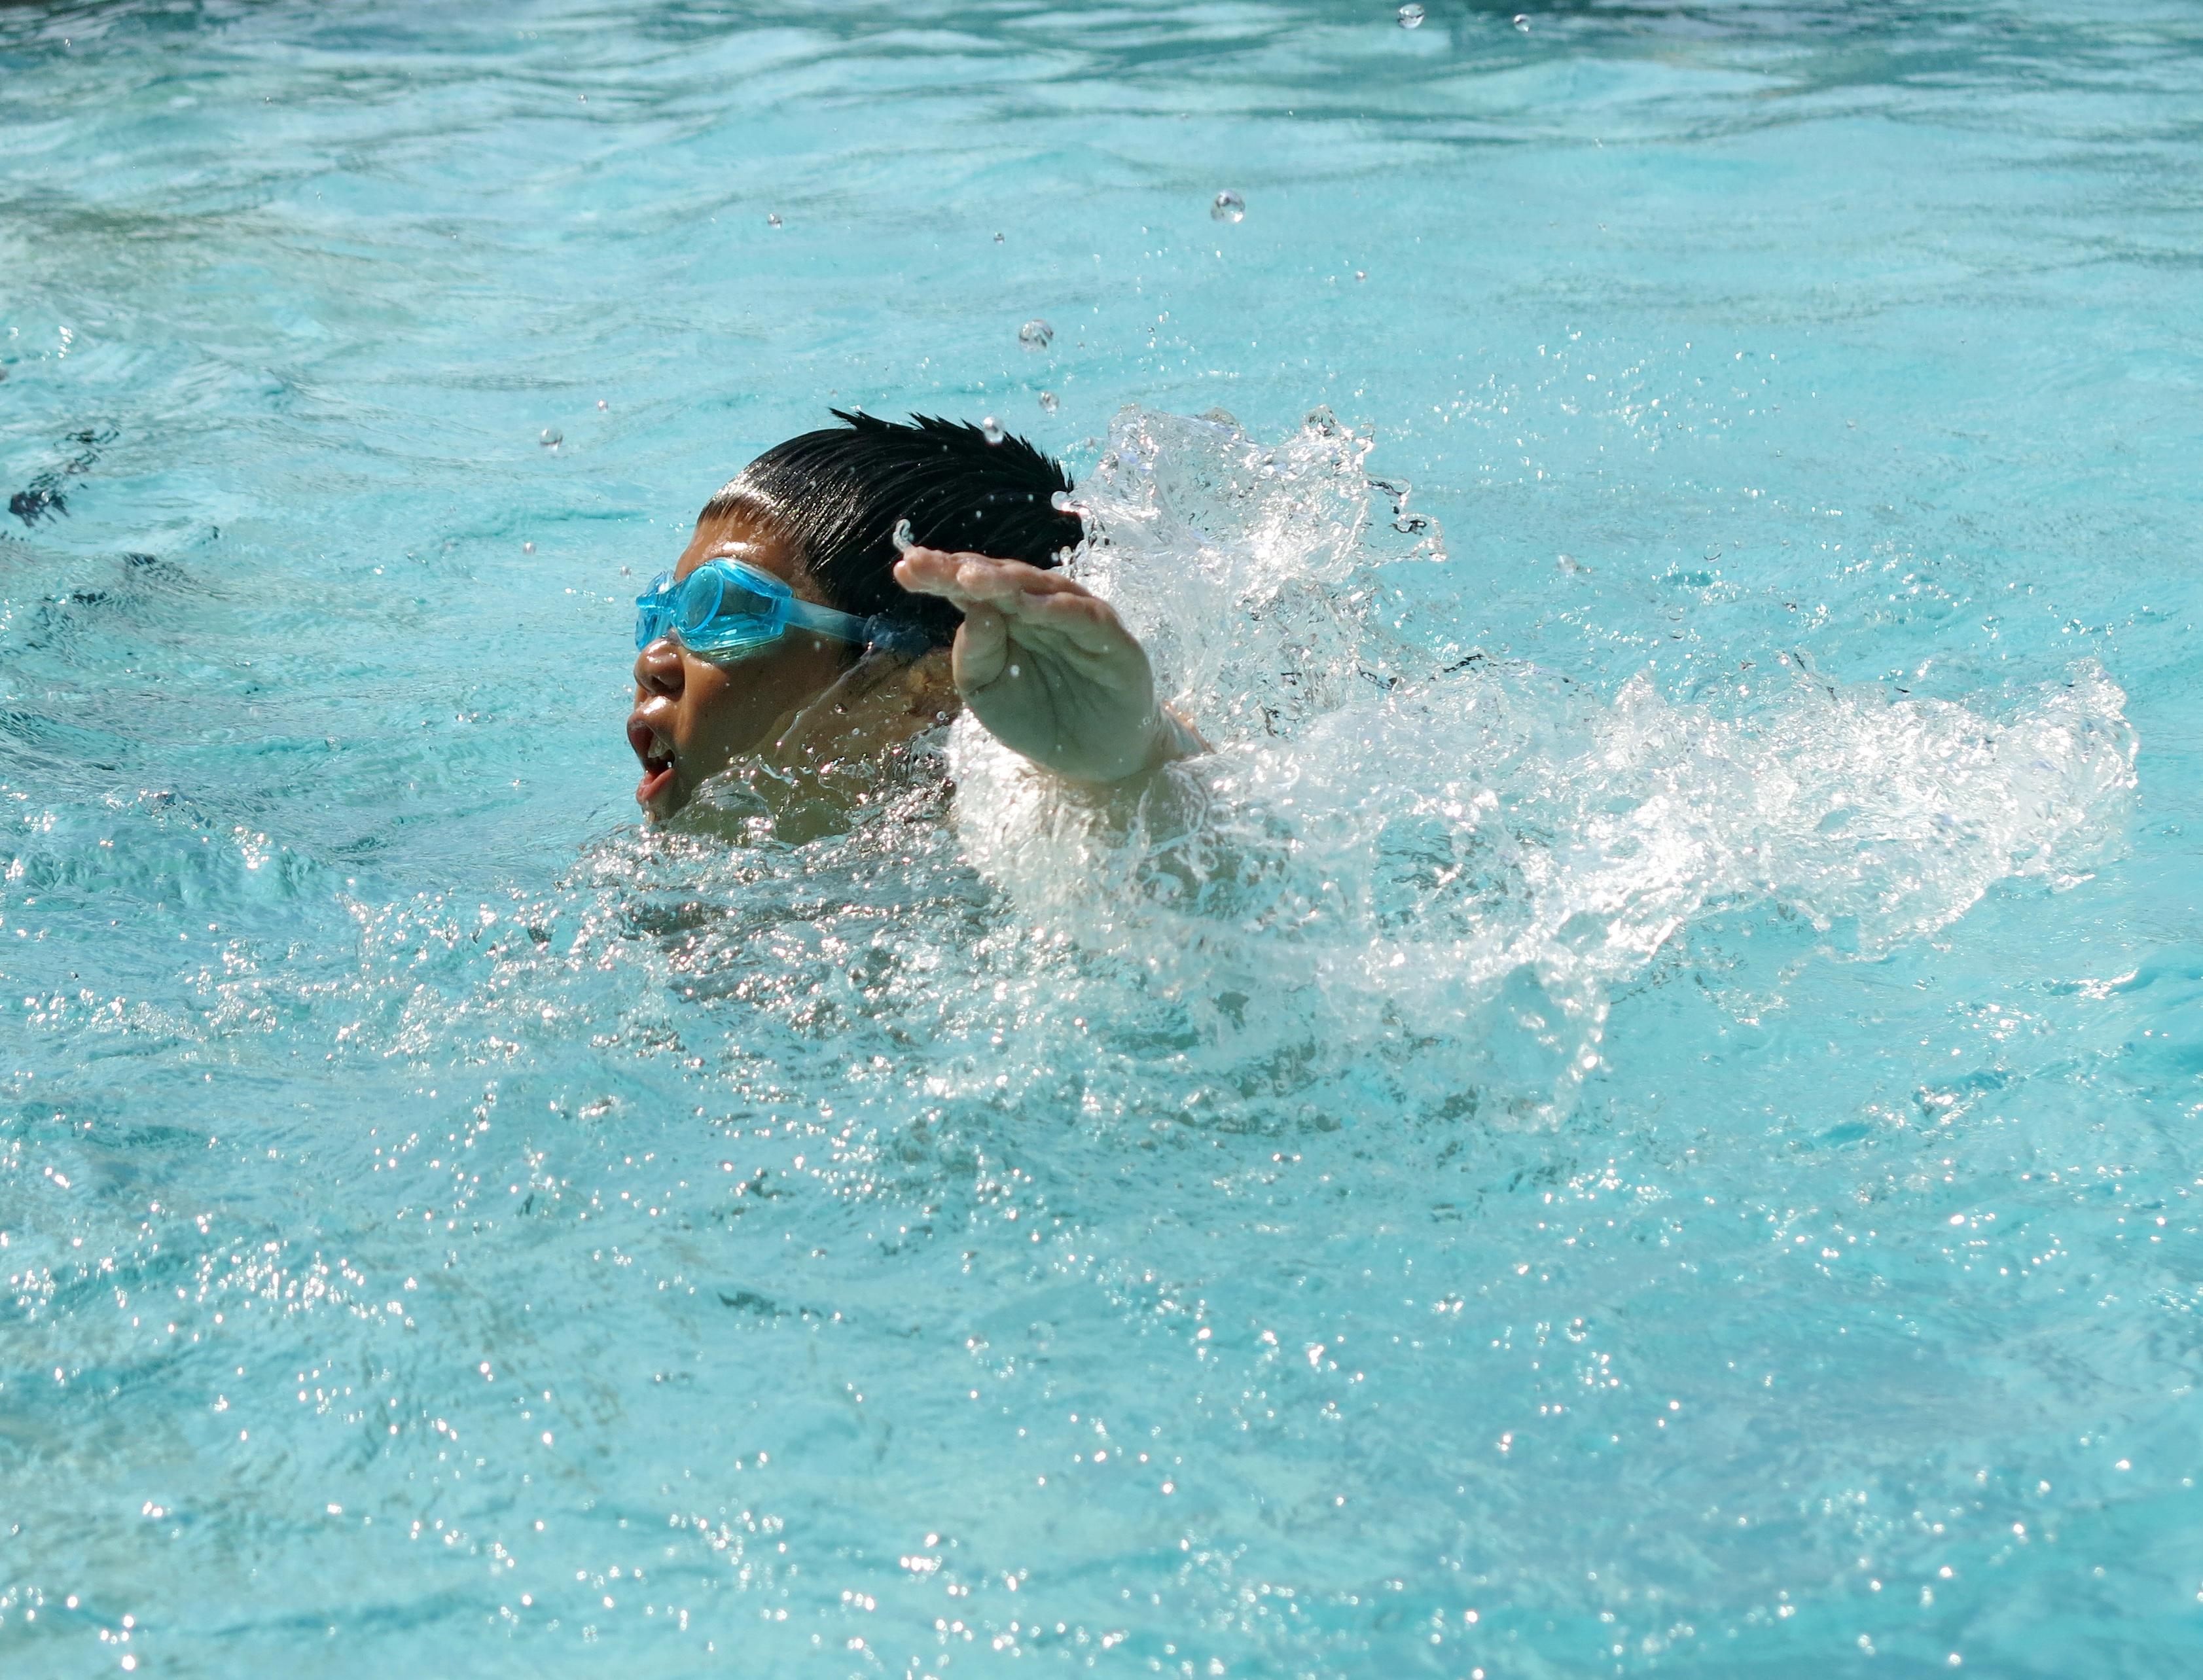 Drowning prevention for children